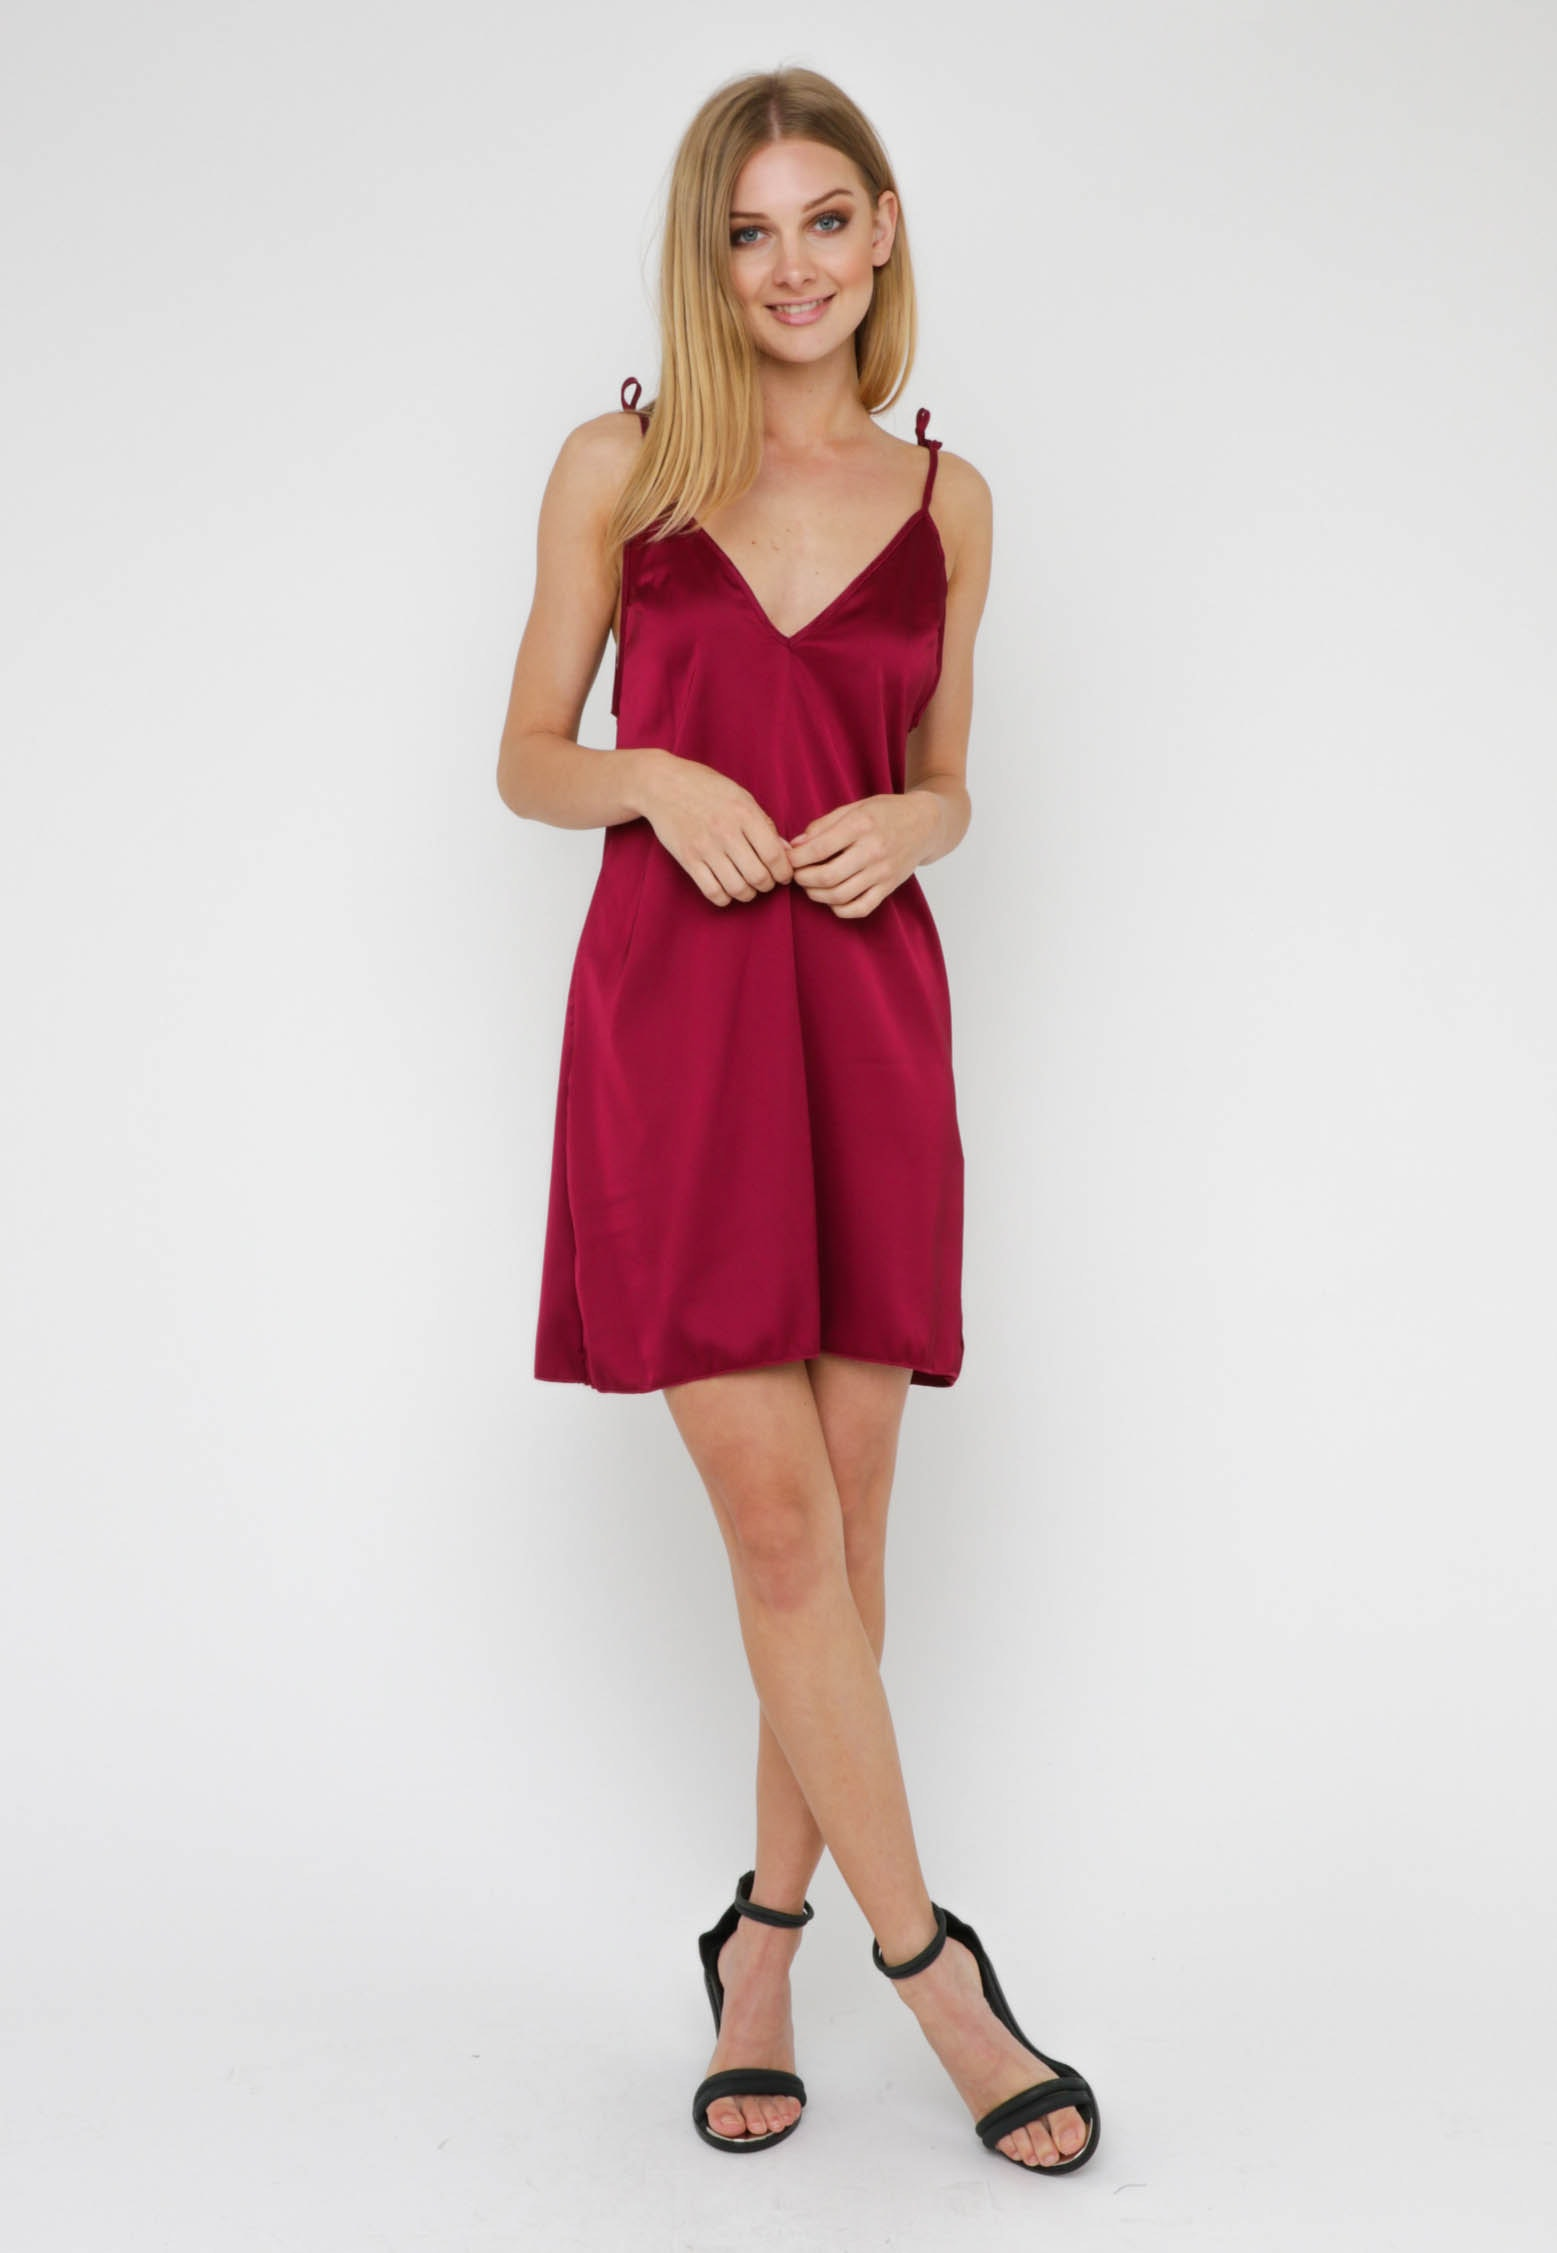 Tie It Up Dress - Wine